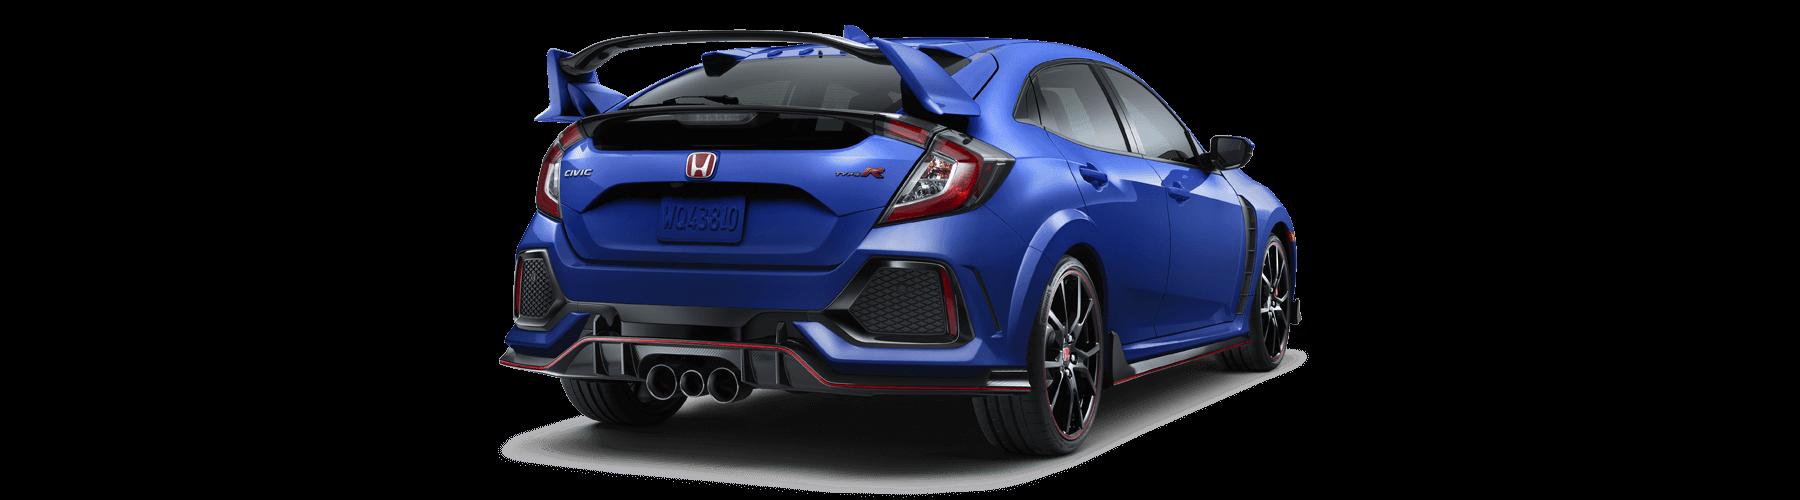 2018 Honda Civic Type R Rear Angle